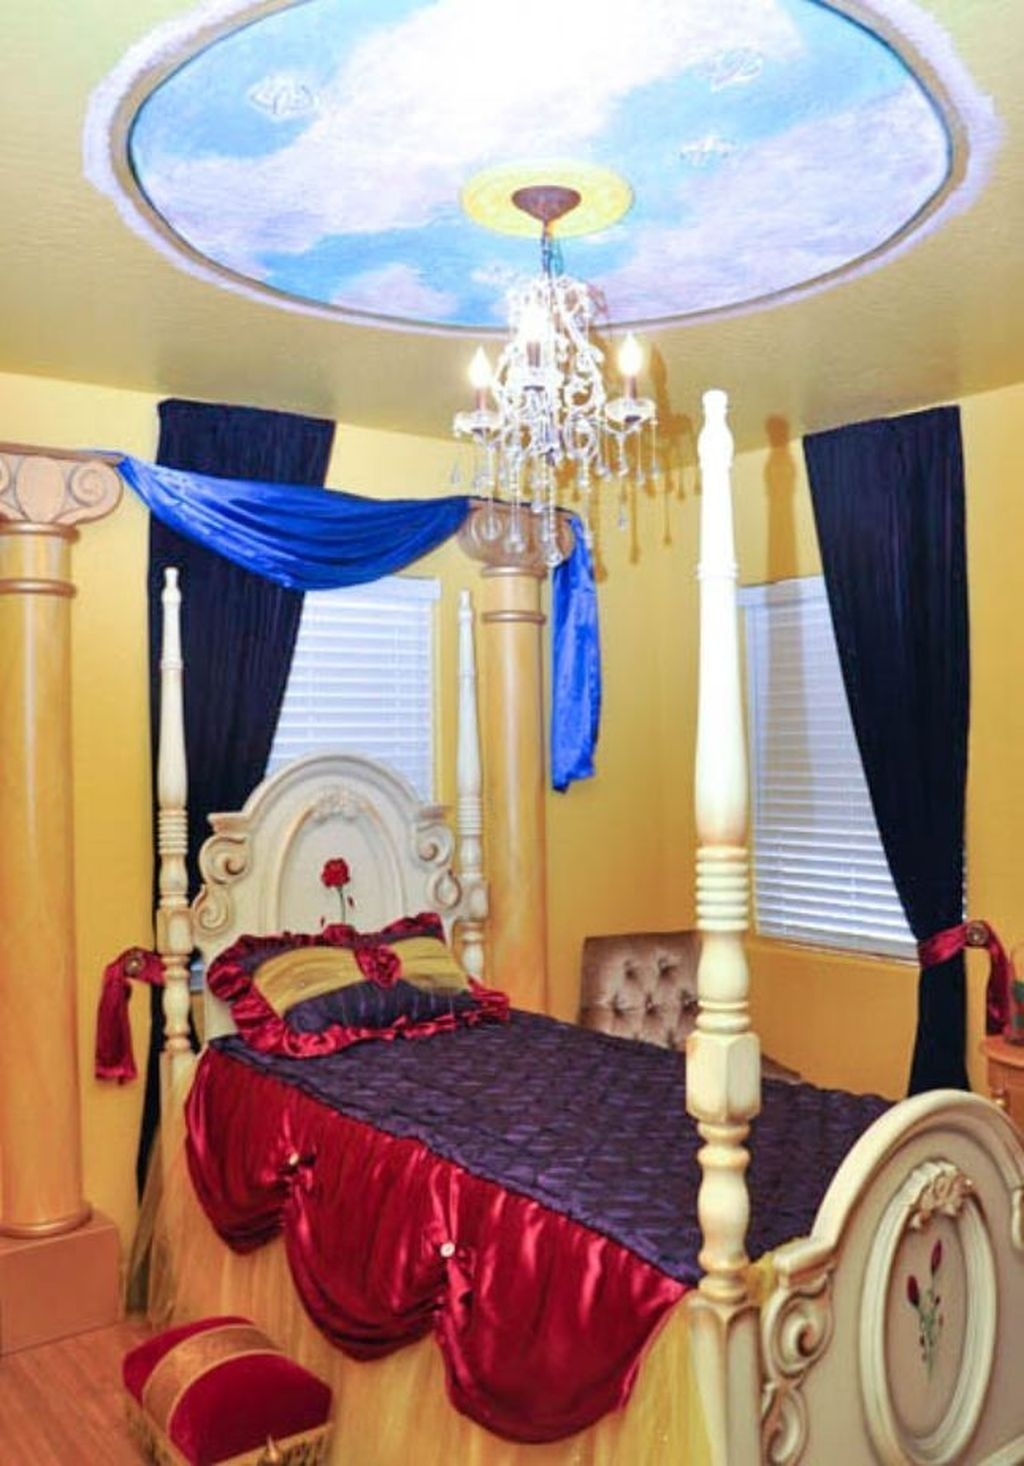 Adorable Disney Room Design Ideas For Your Childrens Room 29